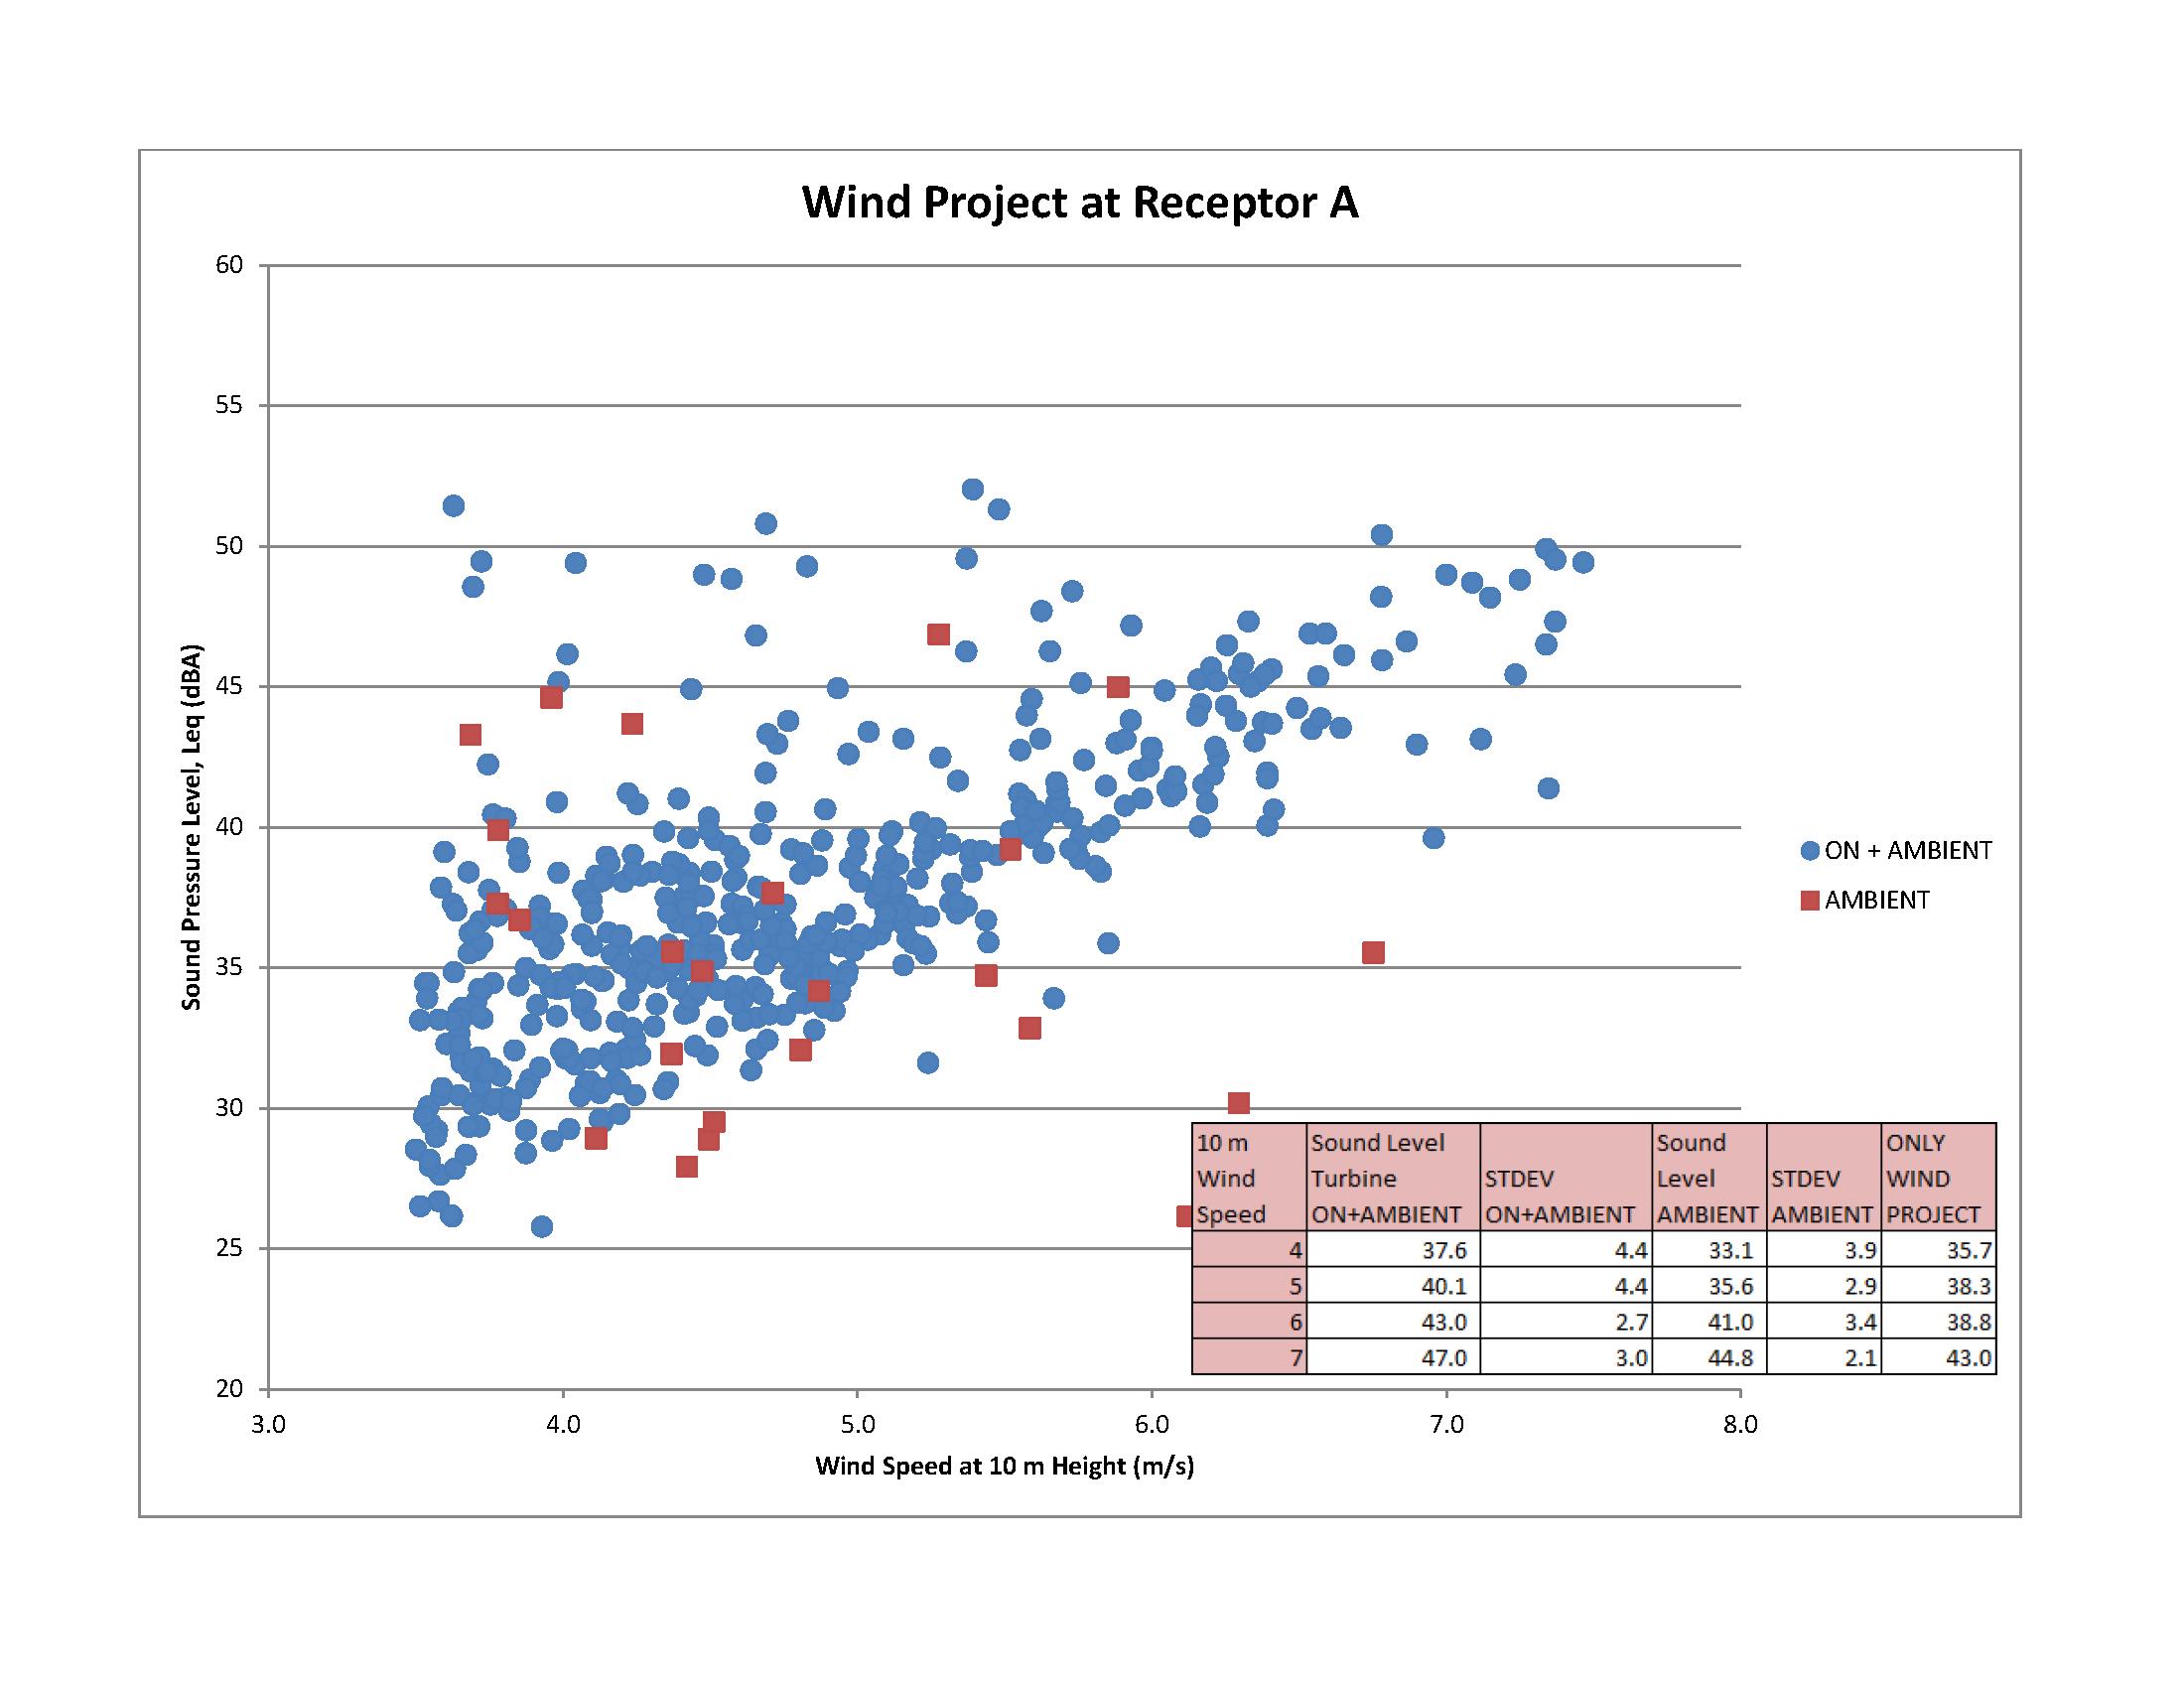 Compliance Protocol For Wind Turbine Noise Rain Sound Effects Generator Circuit Please Contact Eaasibgen A Description Of This Figure